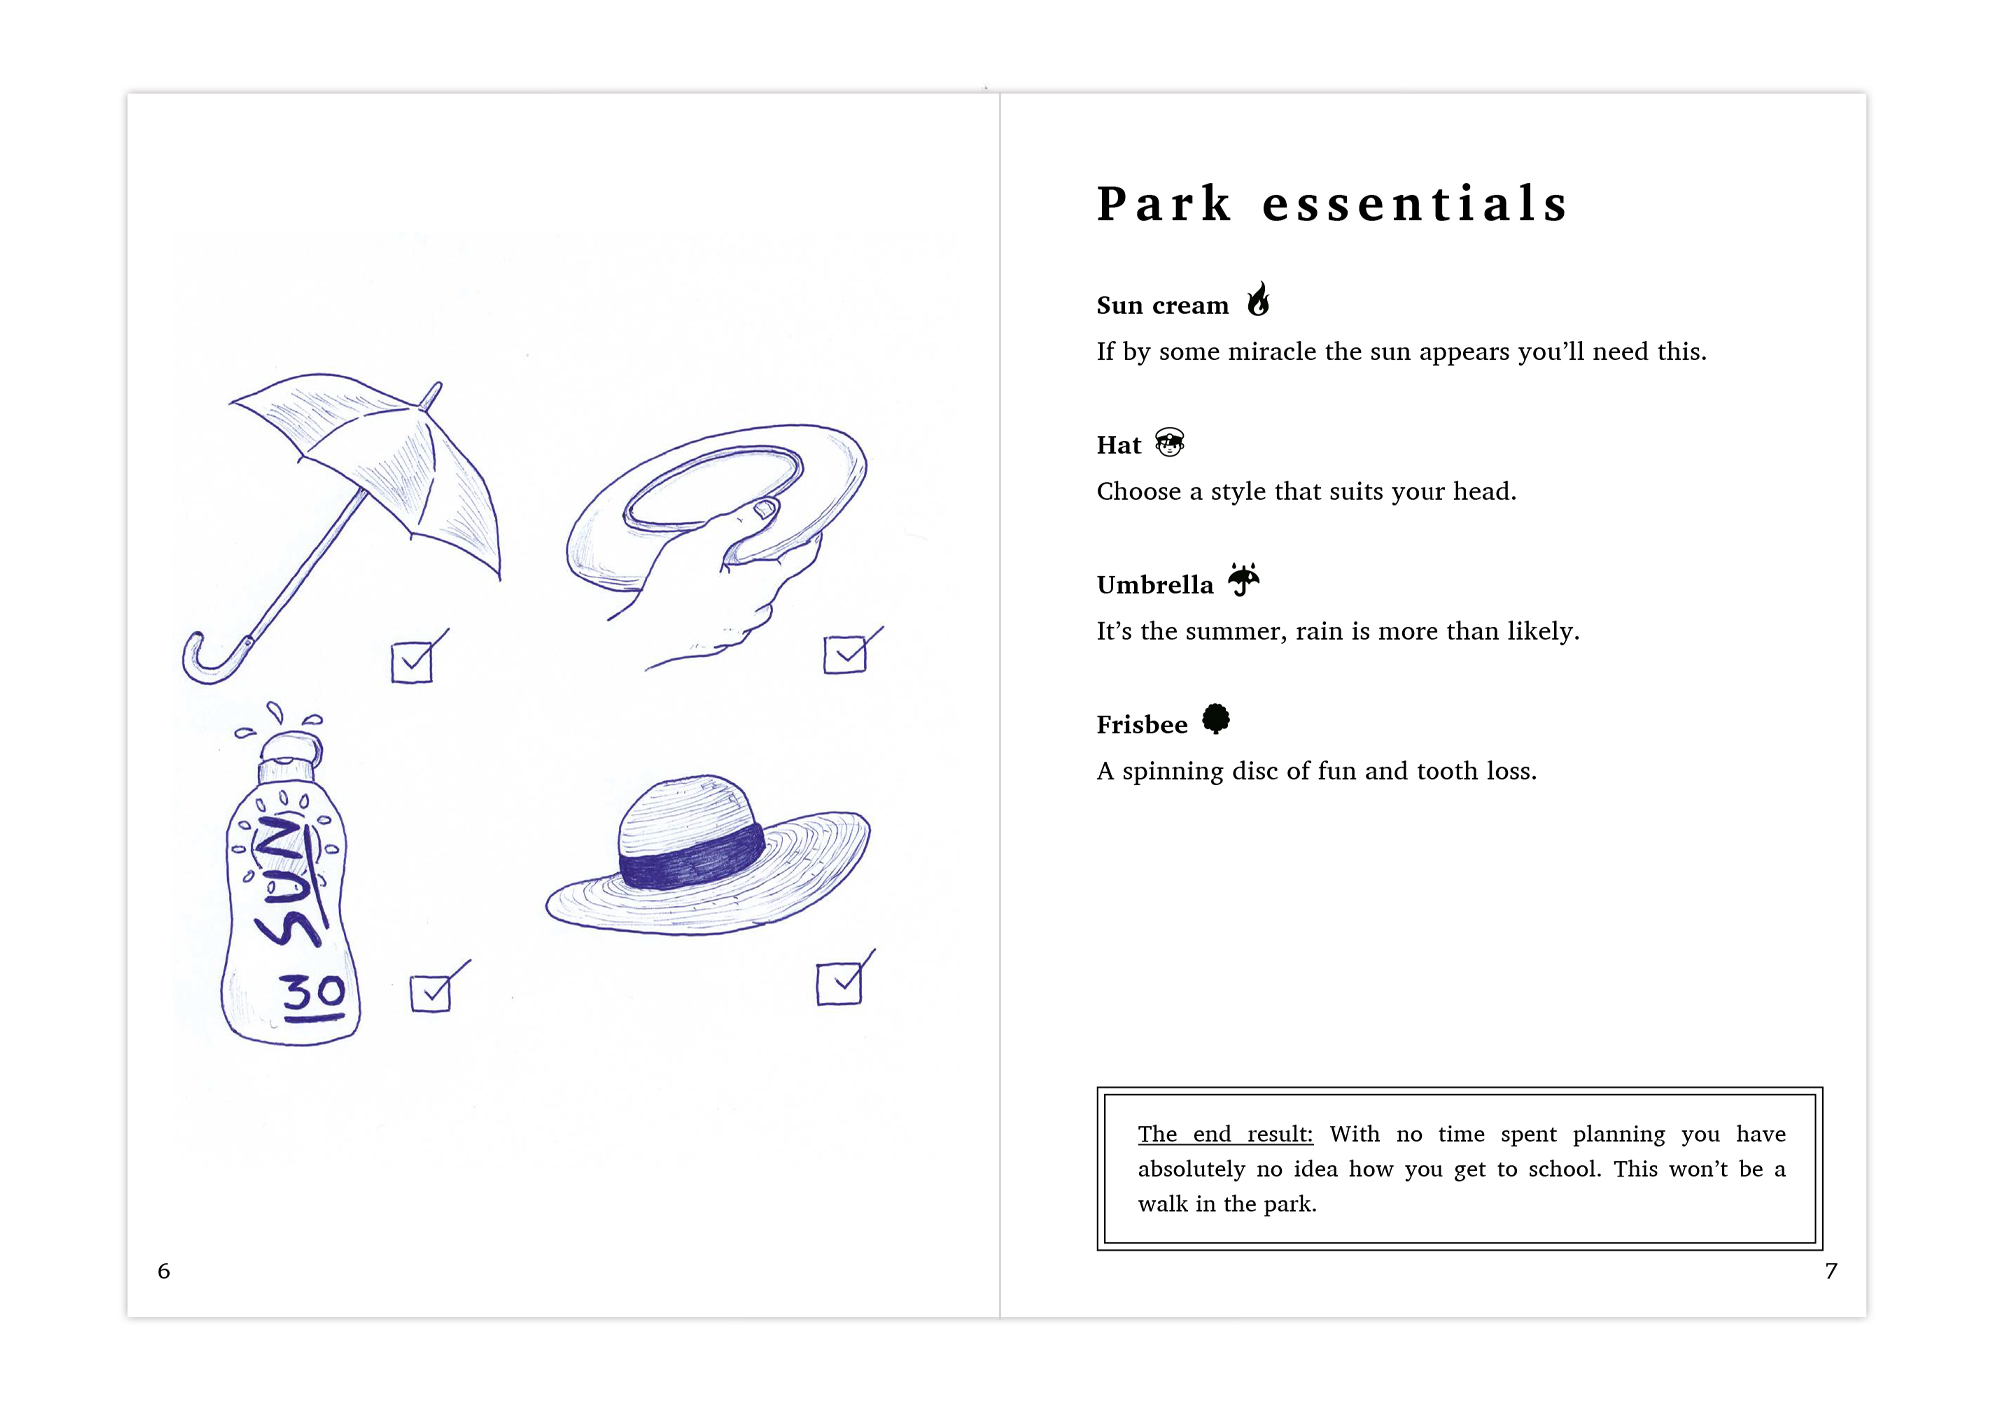 DG-spread-park essentials.jpg